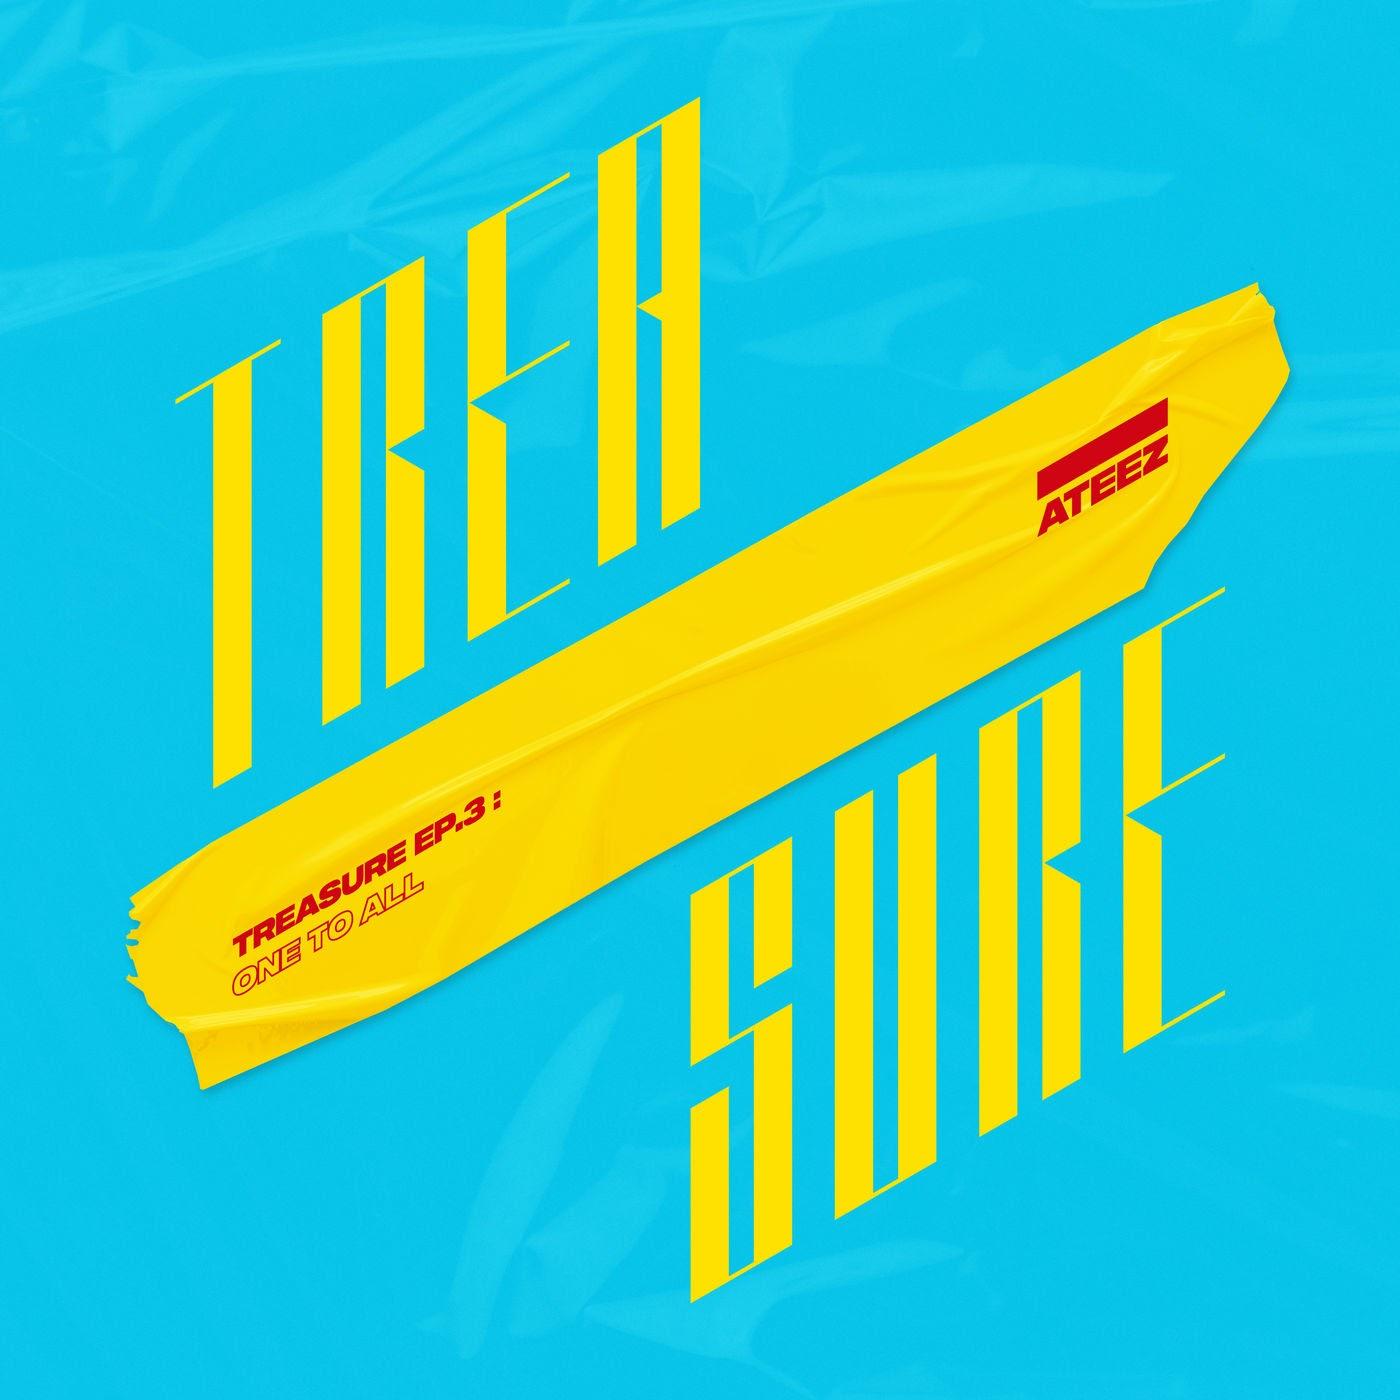 ateez TREASURE EP 3 One To All